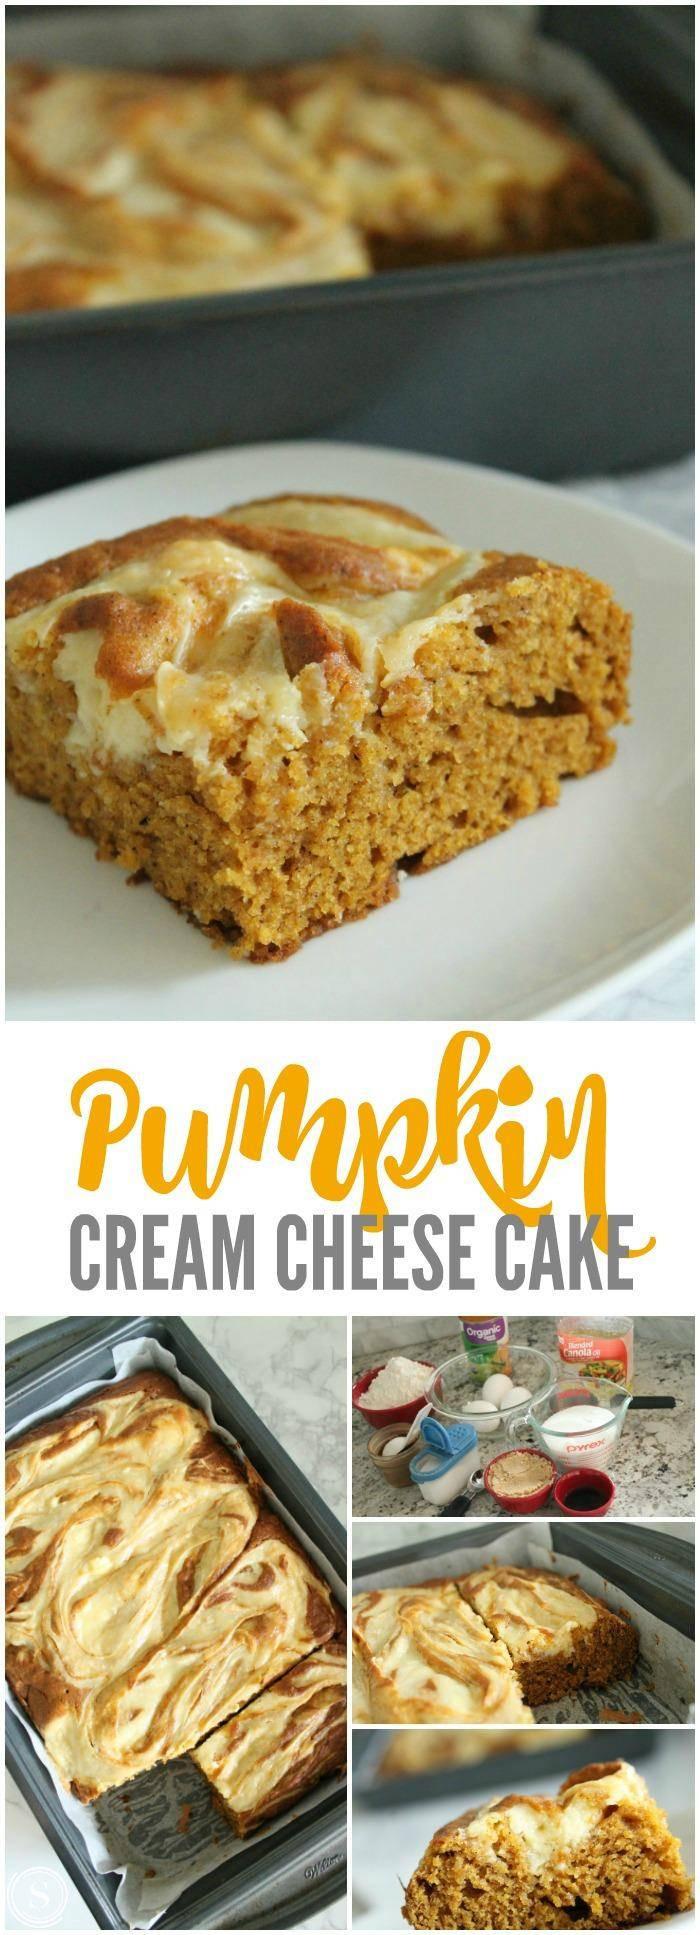 Pumpkin Cream Cheese Dessert  Pumpkin Cream Cheese Cake Recipe Passion for Savings